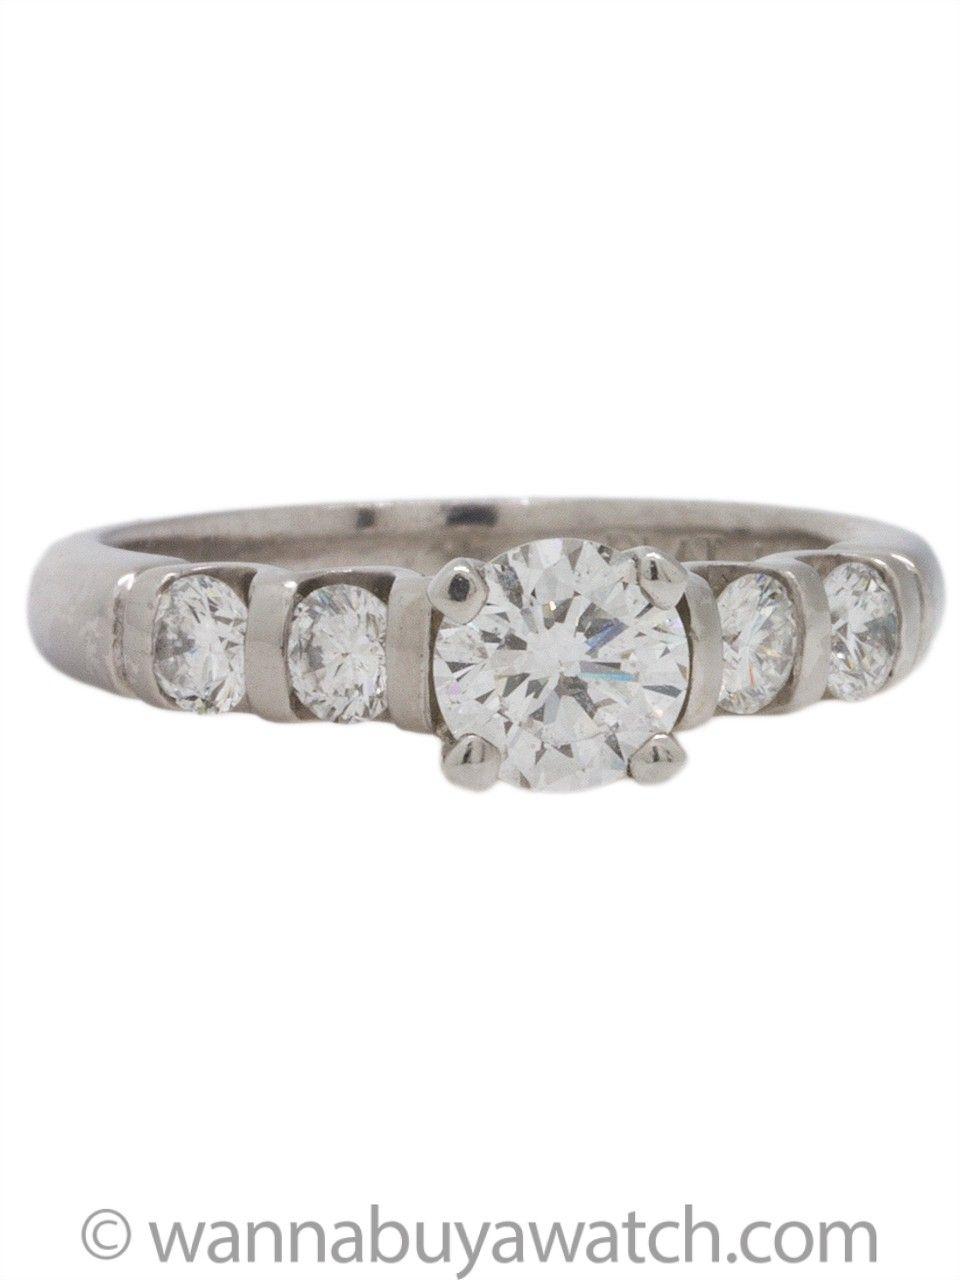 Sleek Substantial Contemporary Platinum Engagement Ring Showcasing A Fiery Igi Certified Round Brilliant Cut Four Bar Set Full Side Diamonds